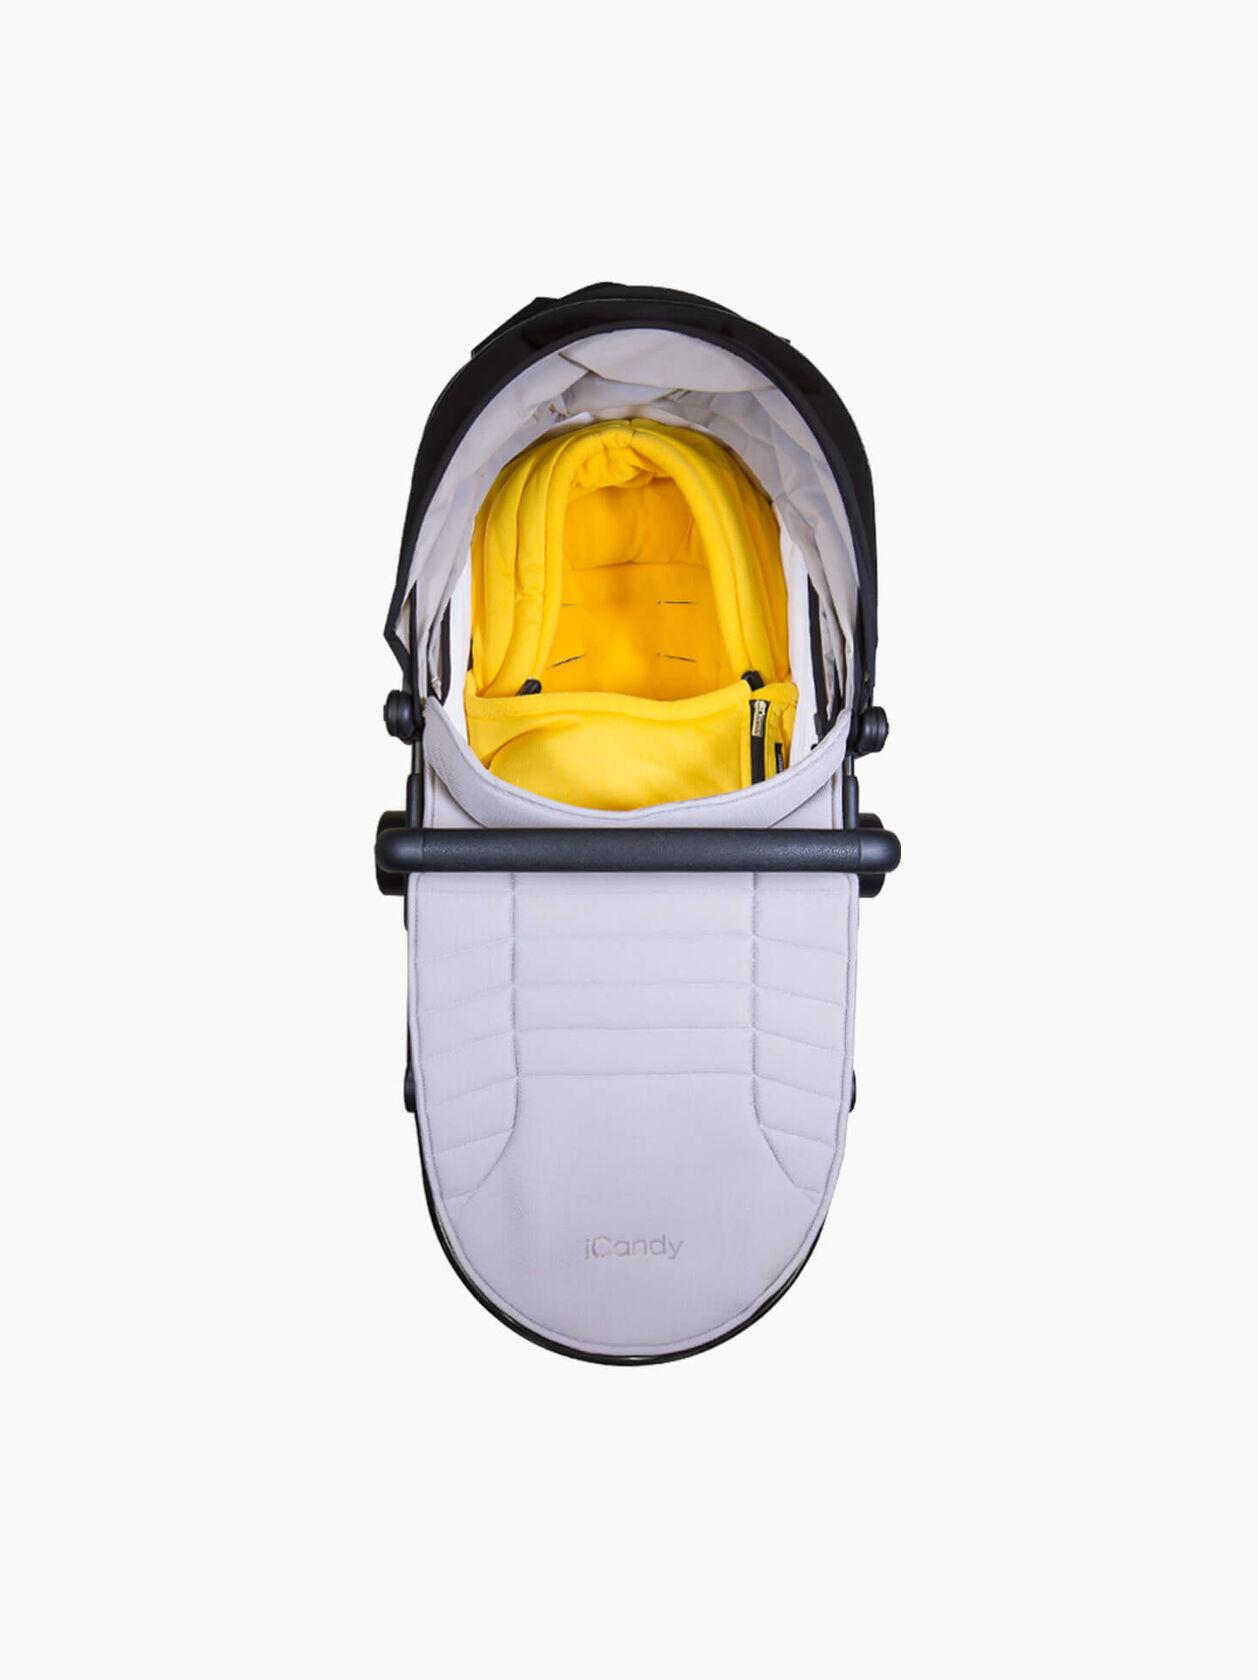 Newborn Pod for iCandy Peach Main Carrycot - Sunflower